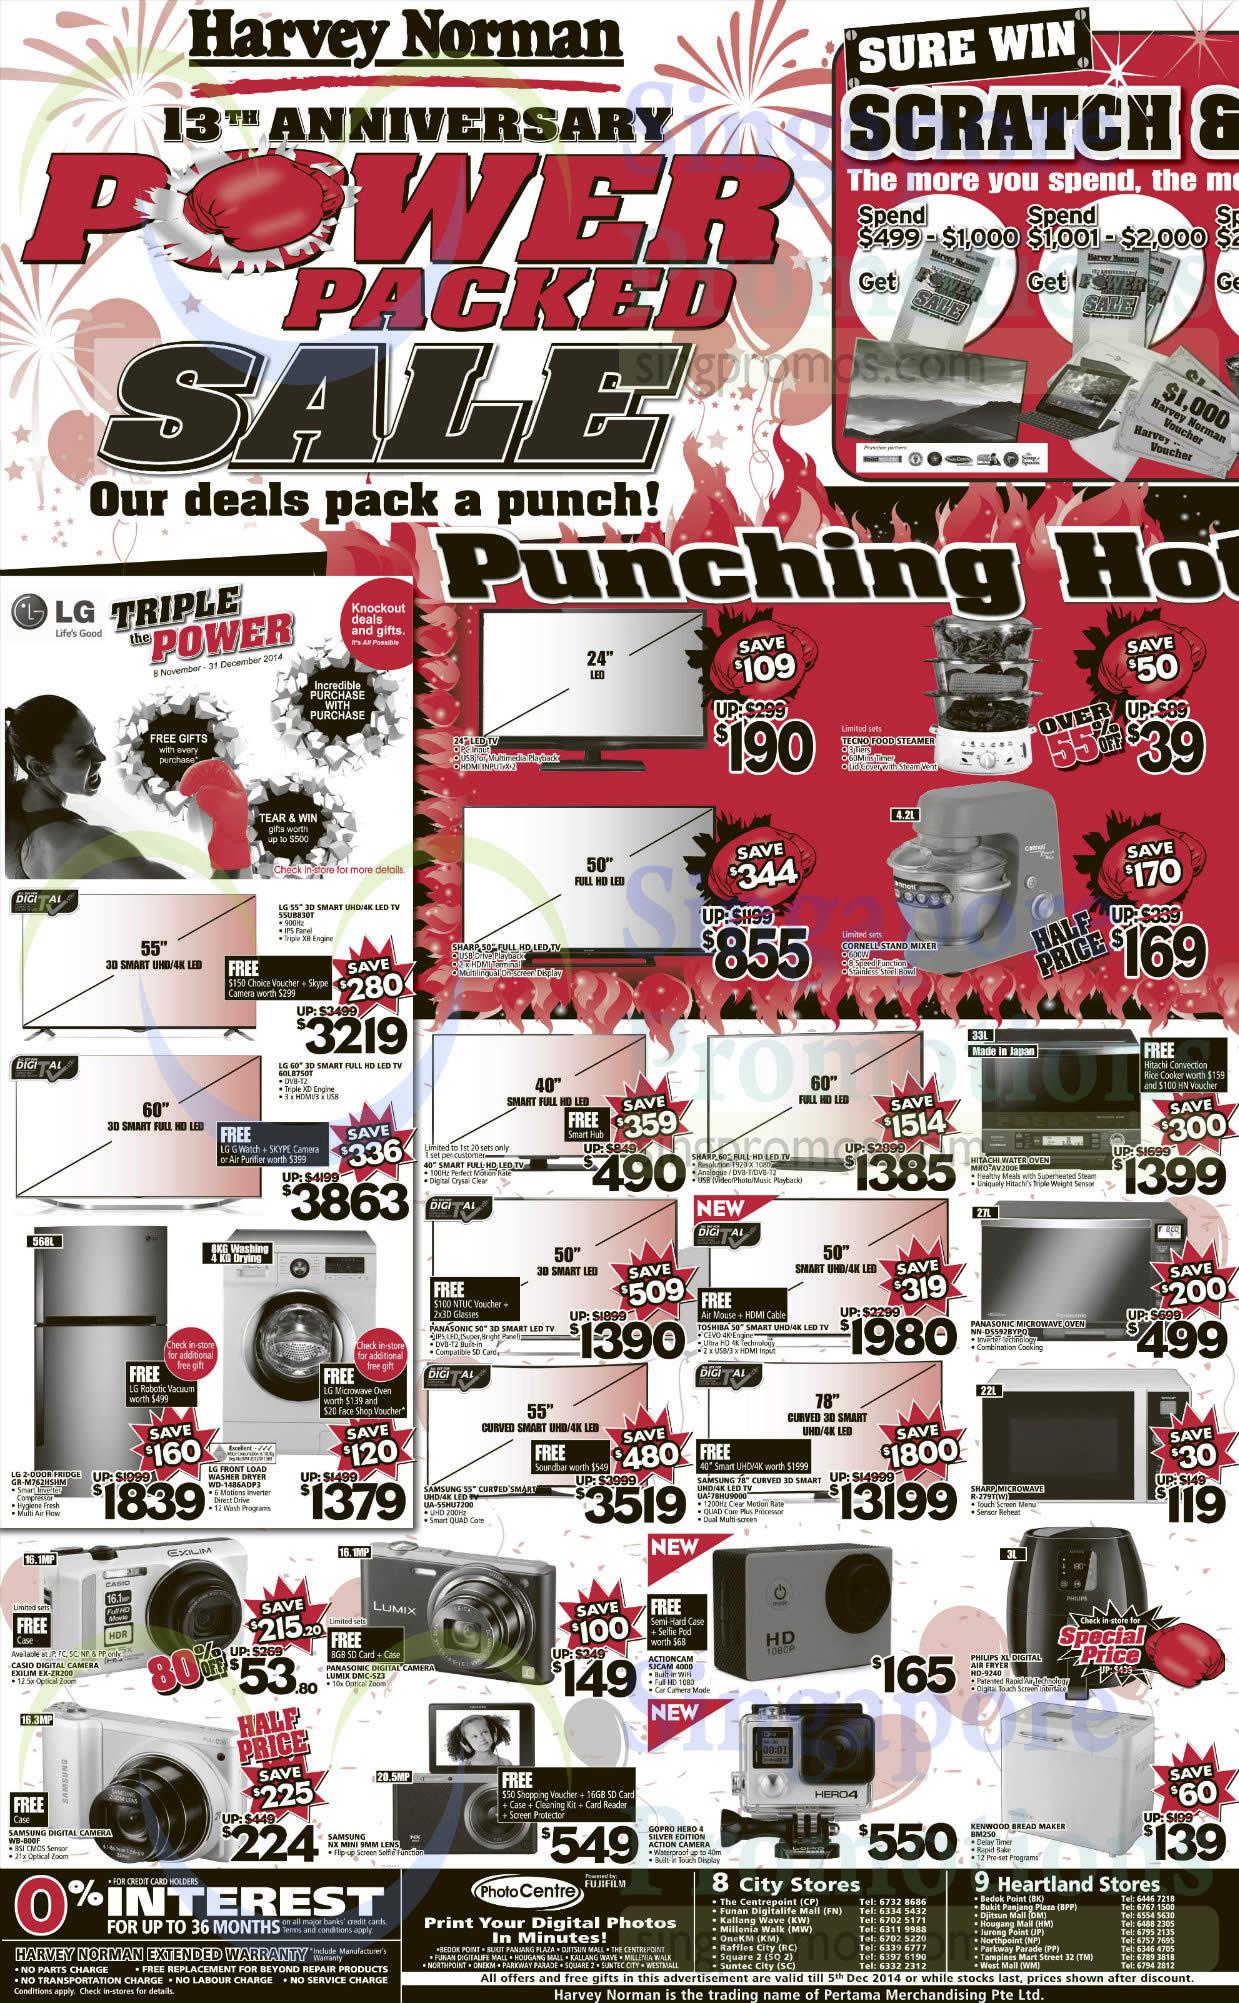 LG 55UB830T TV, LG 60LB750T TV, LG GR-M762HSHM Fridge, LG WD-1486ADP3 Washer, Samsung UA-55HU7200 TV, Samsung UA-78HU9000 TV, Casio EX-ZR200 Digital Camera, Panasonic DMC-S23 Digital Camera, Samsung WB-800F Digital Camera, Actioncam SJCam 4000 Digital Camera, GoPro Hero 4 Video Camera, Hitachi MRO-AV200E Oven, Panasonic NN-D5592BYPQ Oven, Sharp R-279T(W) Oven and Kenwood BM250 Bread Maker